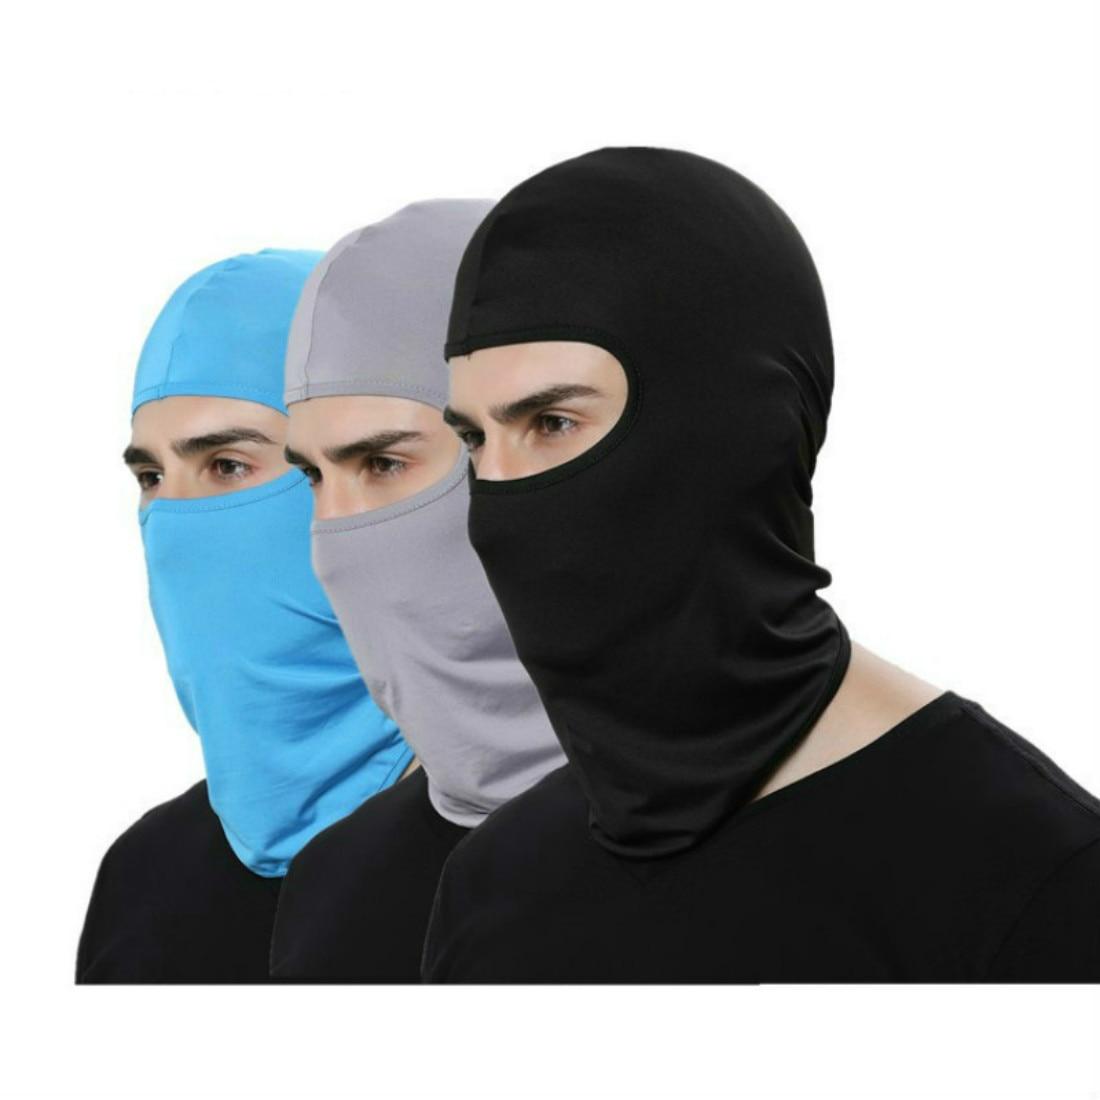 2018 Motorcycle Face Mask Moto Winter Warm Ski Snowboard Outdoor Sports Neck Wind Cap Police Cycling Balaclavas Face Mask